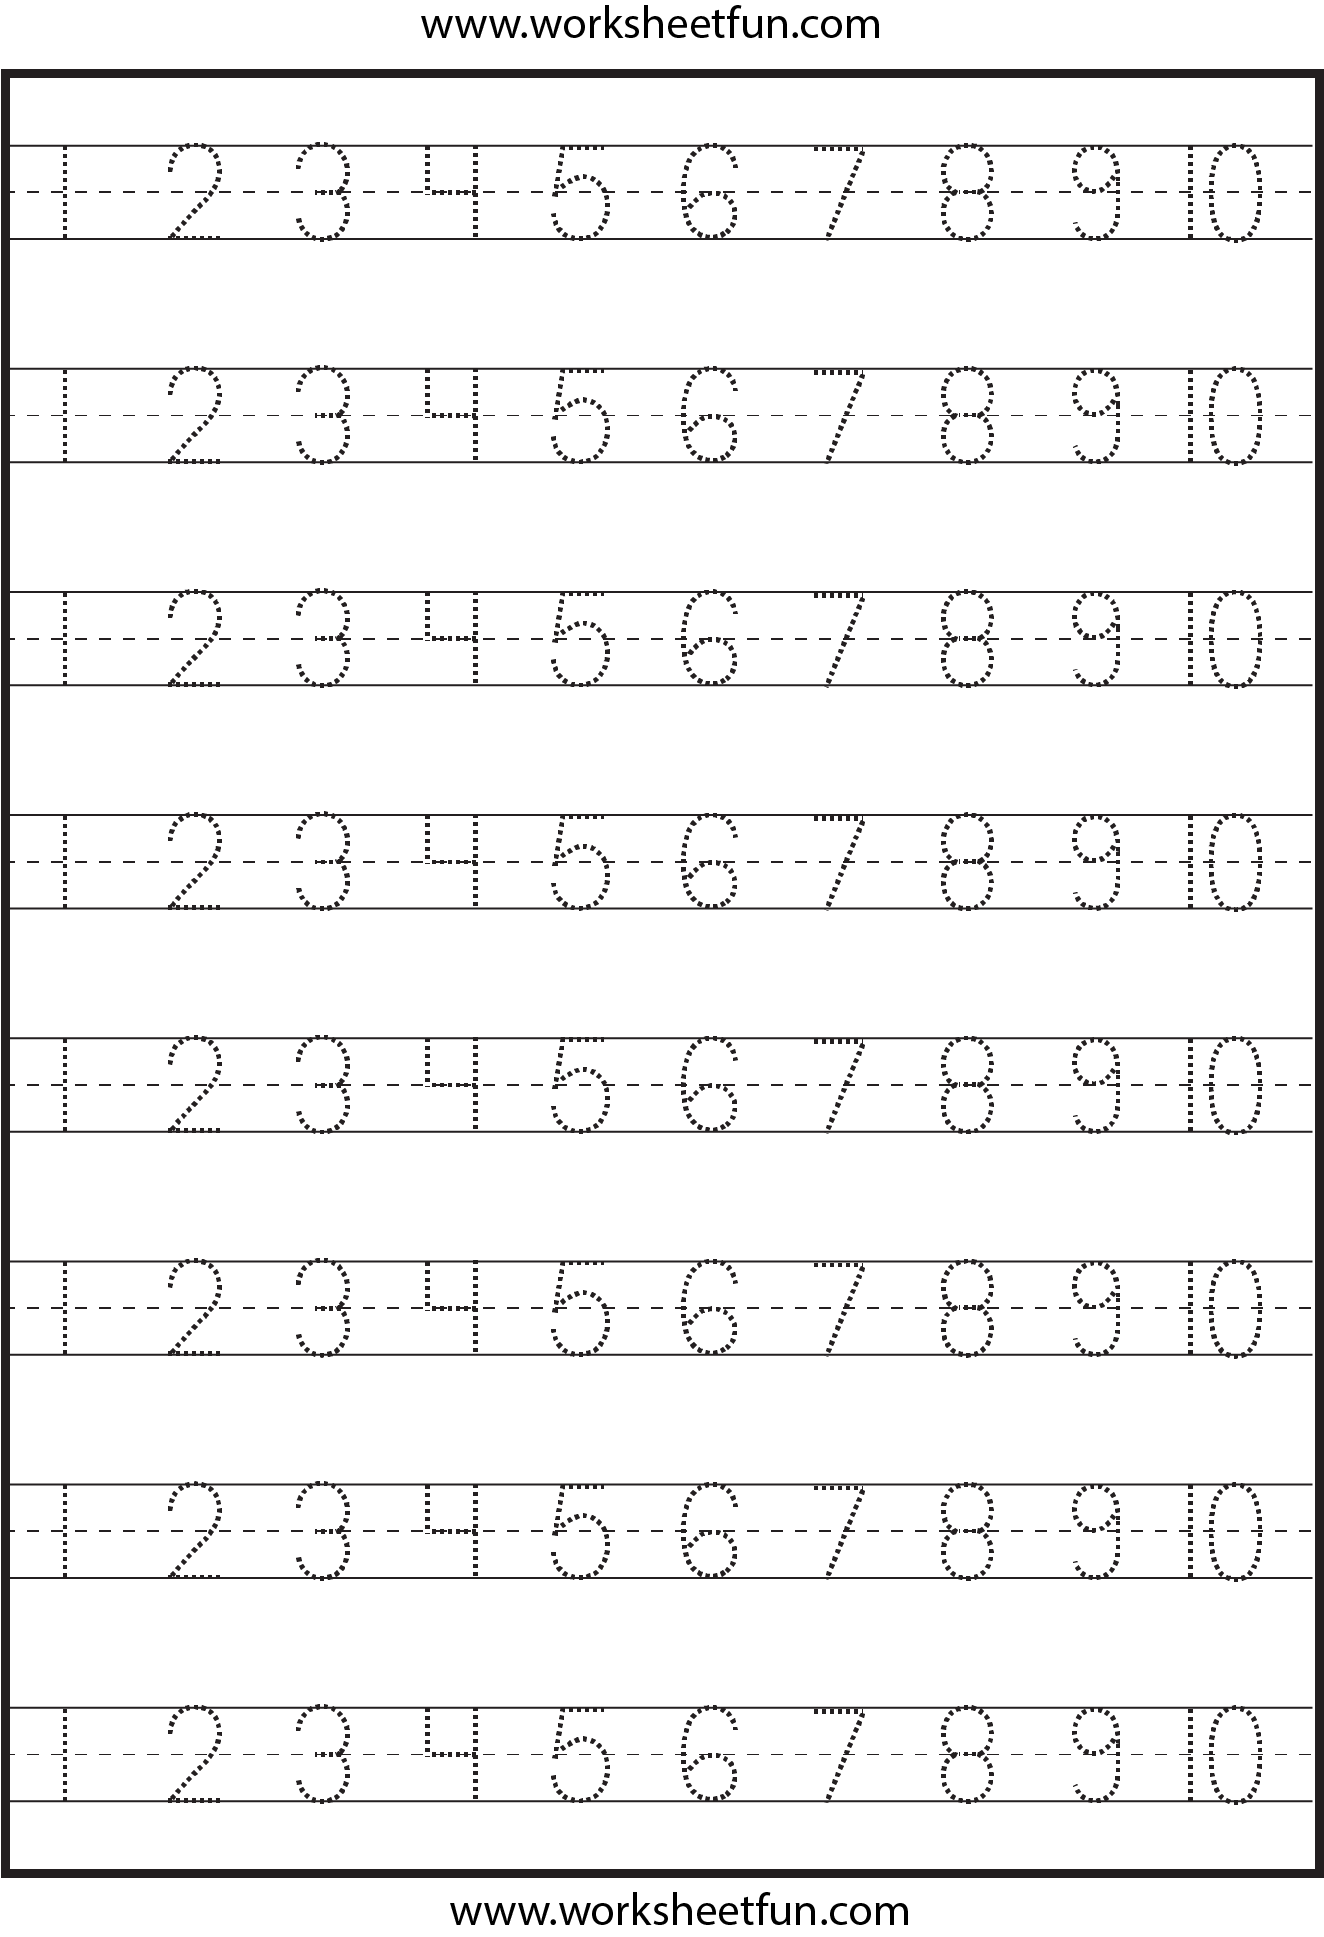 writing numbers 1 20 Zero, sefr صفر ۰ one, yek یک ١ two, do دو ۲ three, se سه ۳ four, chāhār  چهار ۴ five, panj پنج ۵ six, shesh شش ۶ seven, haft هفت ۷ eight, hasht هشت .